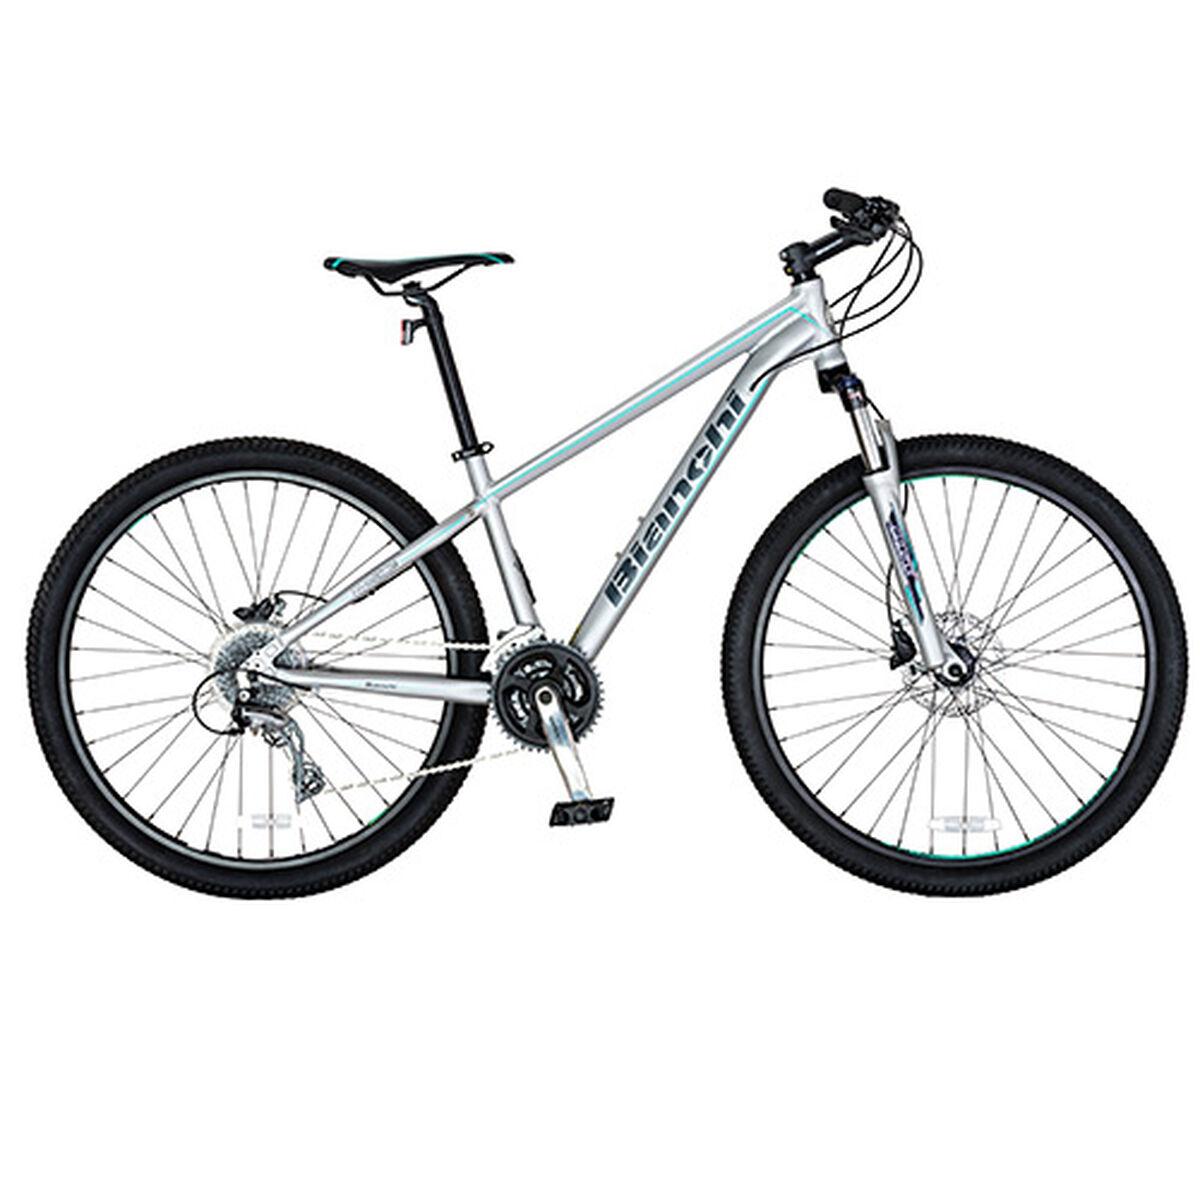 Bicicleta Bianchi Hombre BBB00046 Aro 26